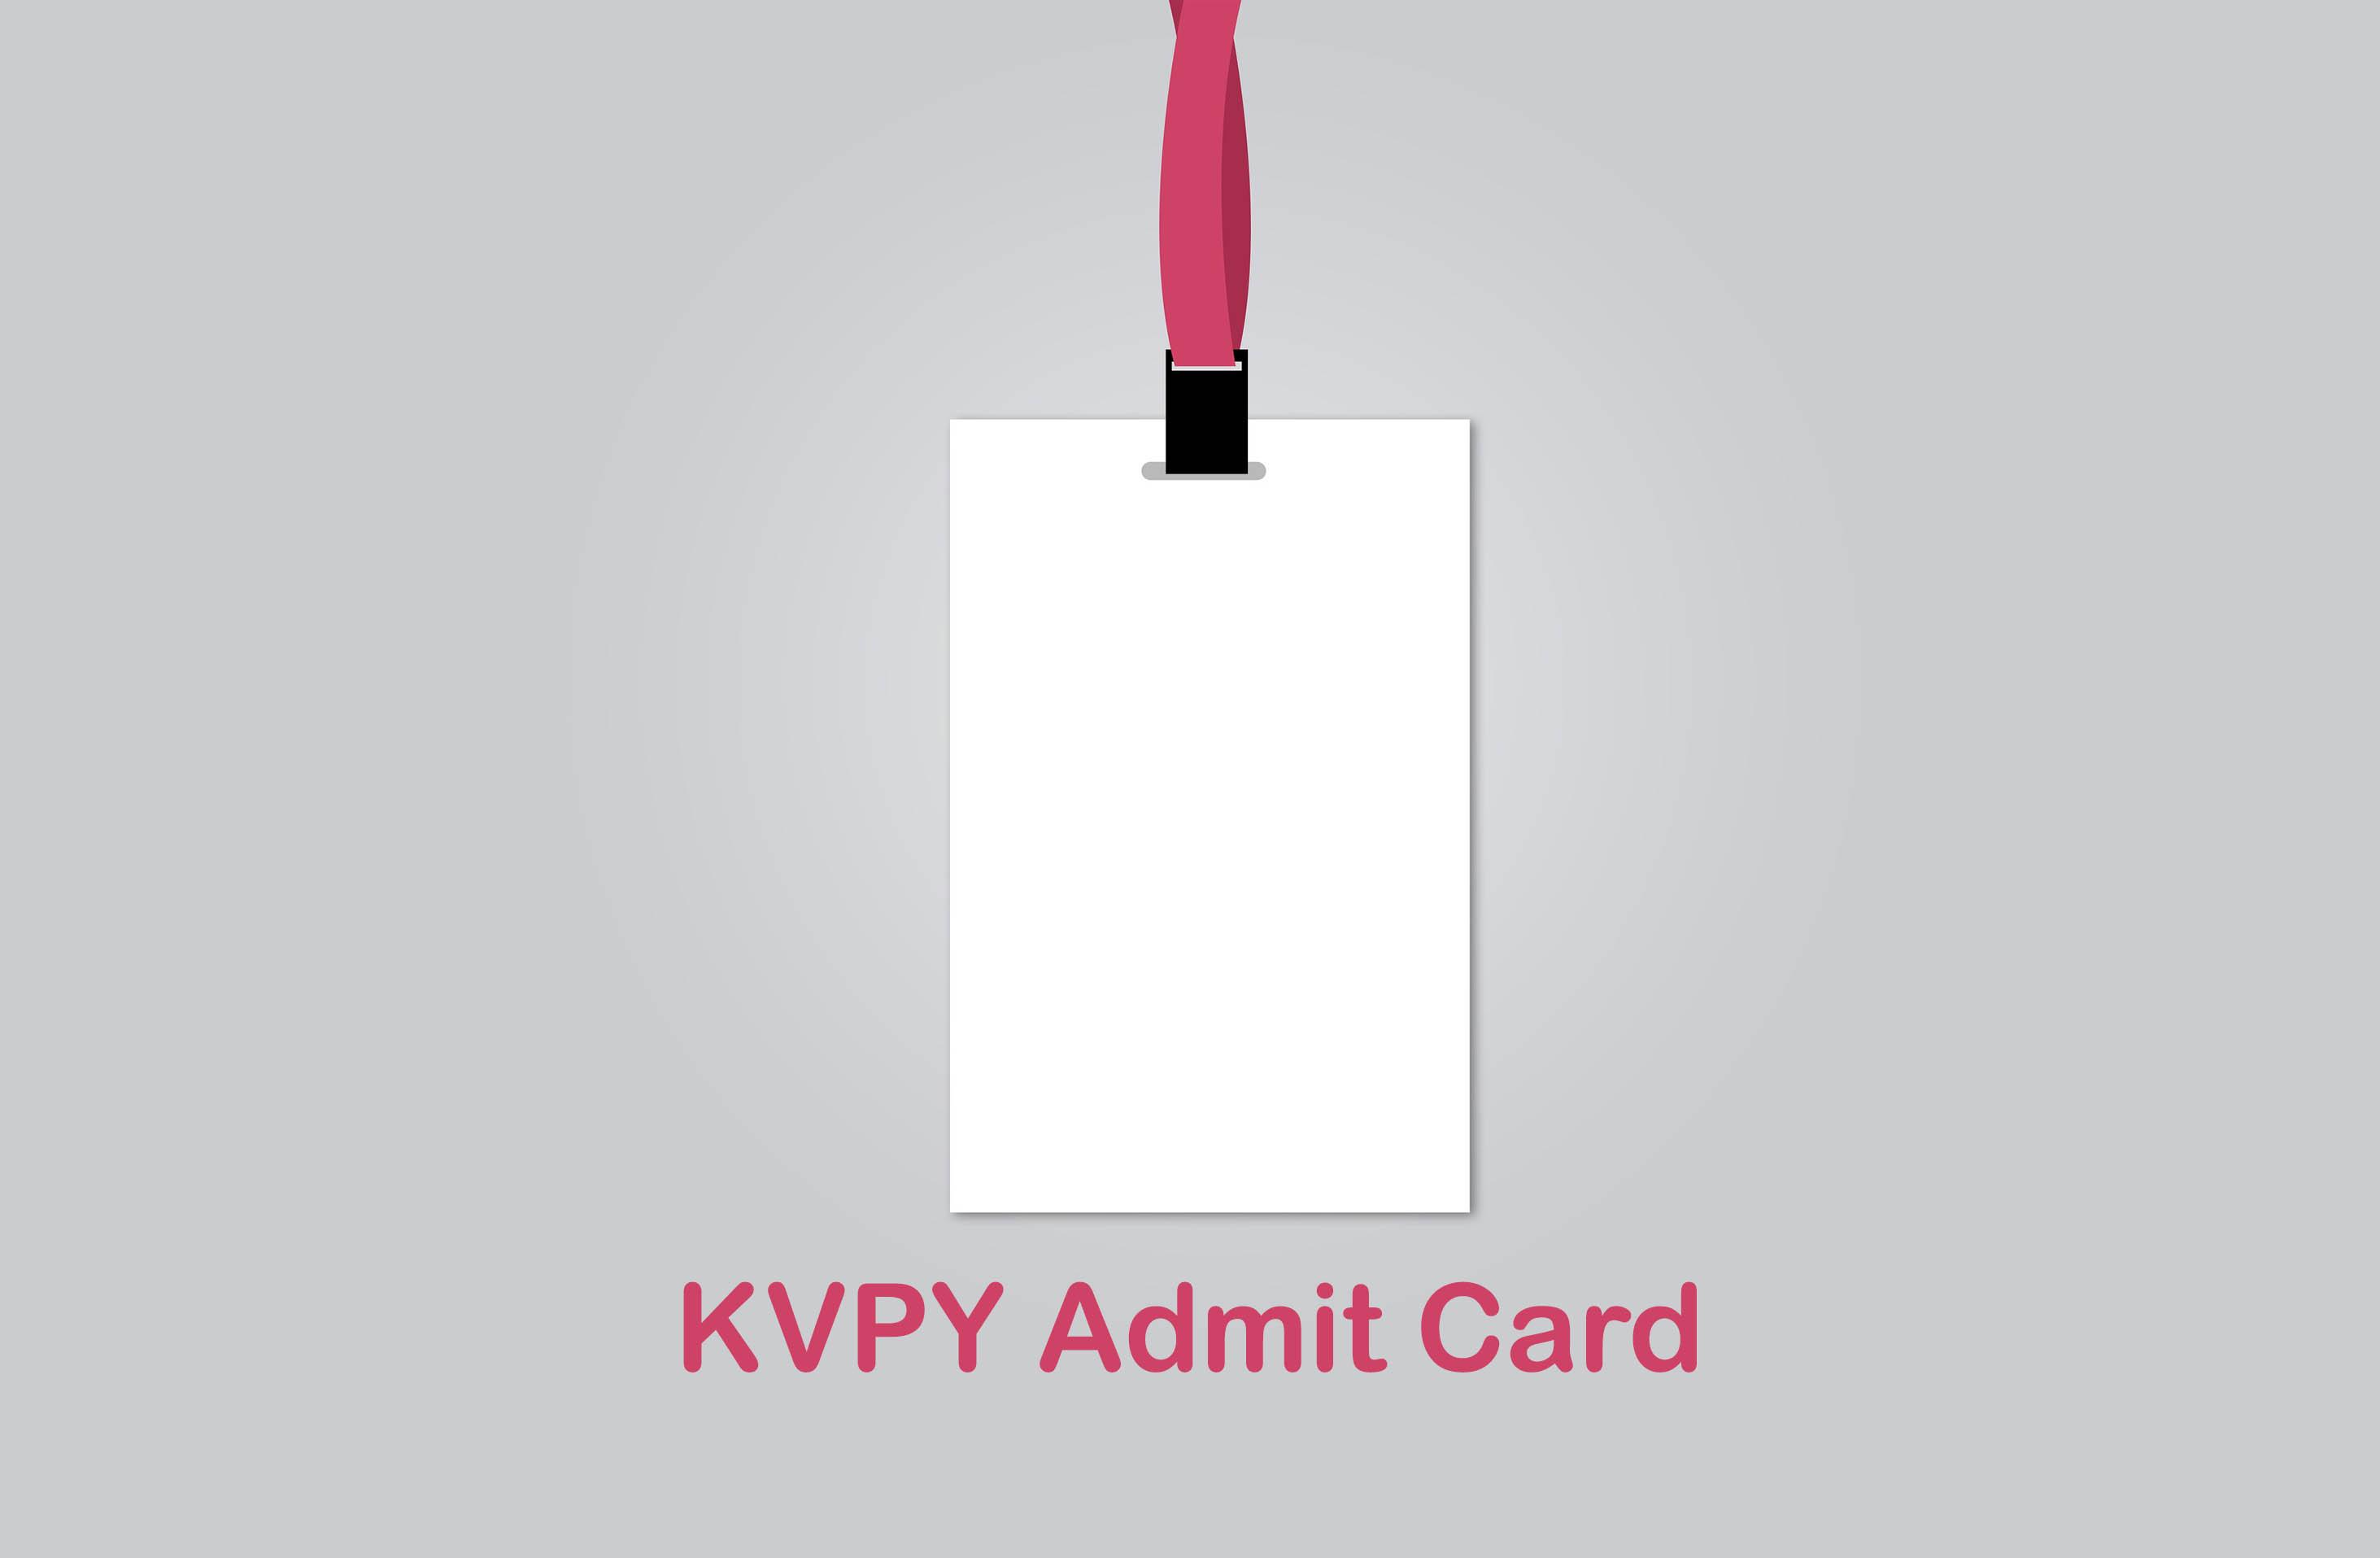 KVPY Admit Card